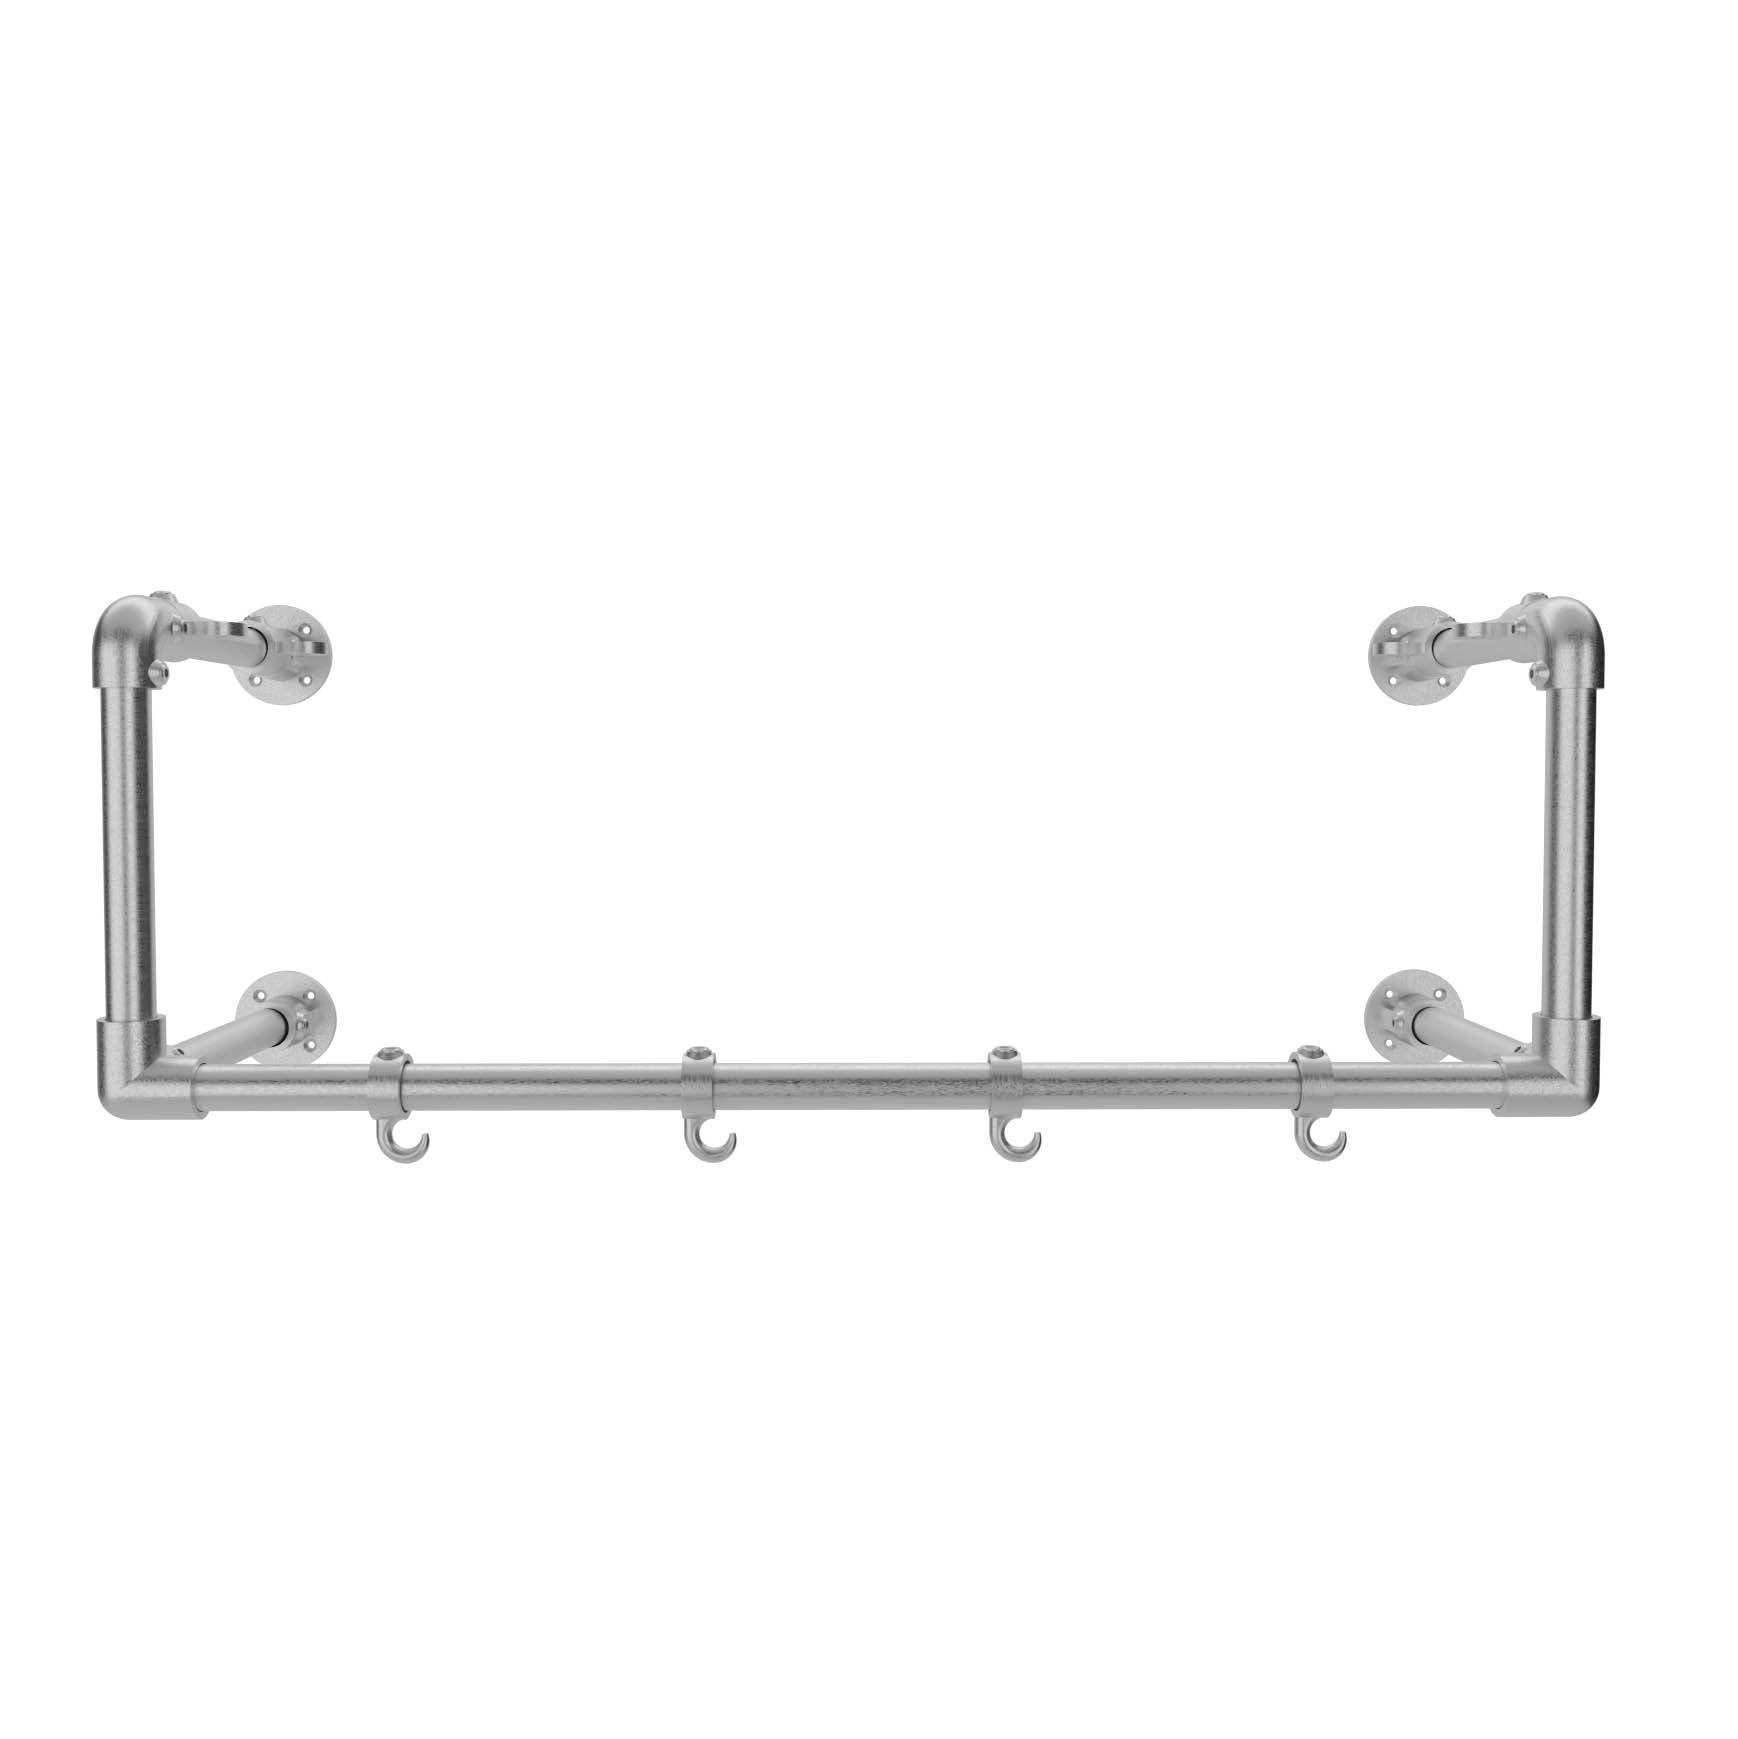 Wall mounted coat rack kit with 4 hooks